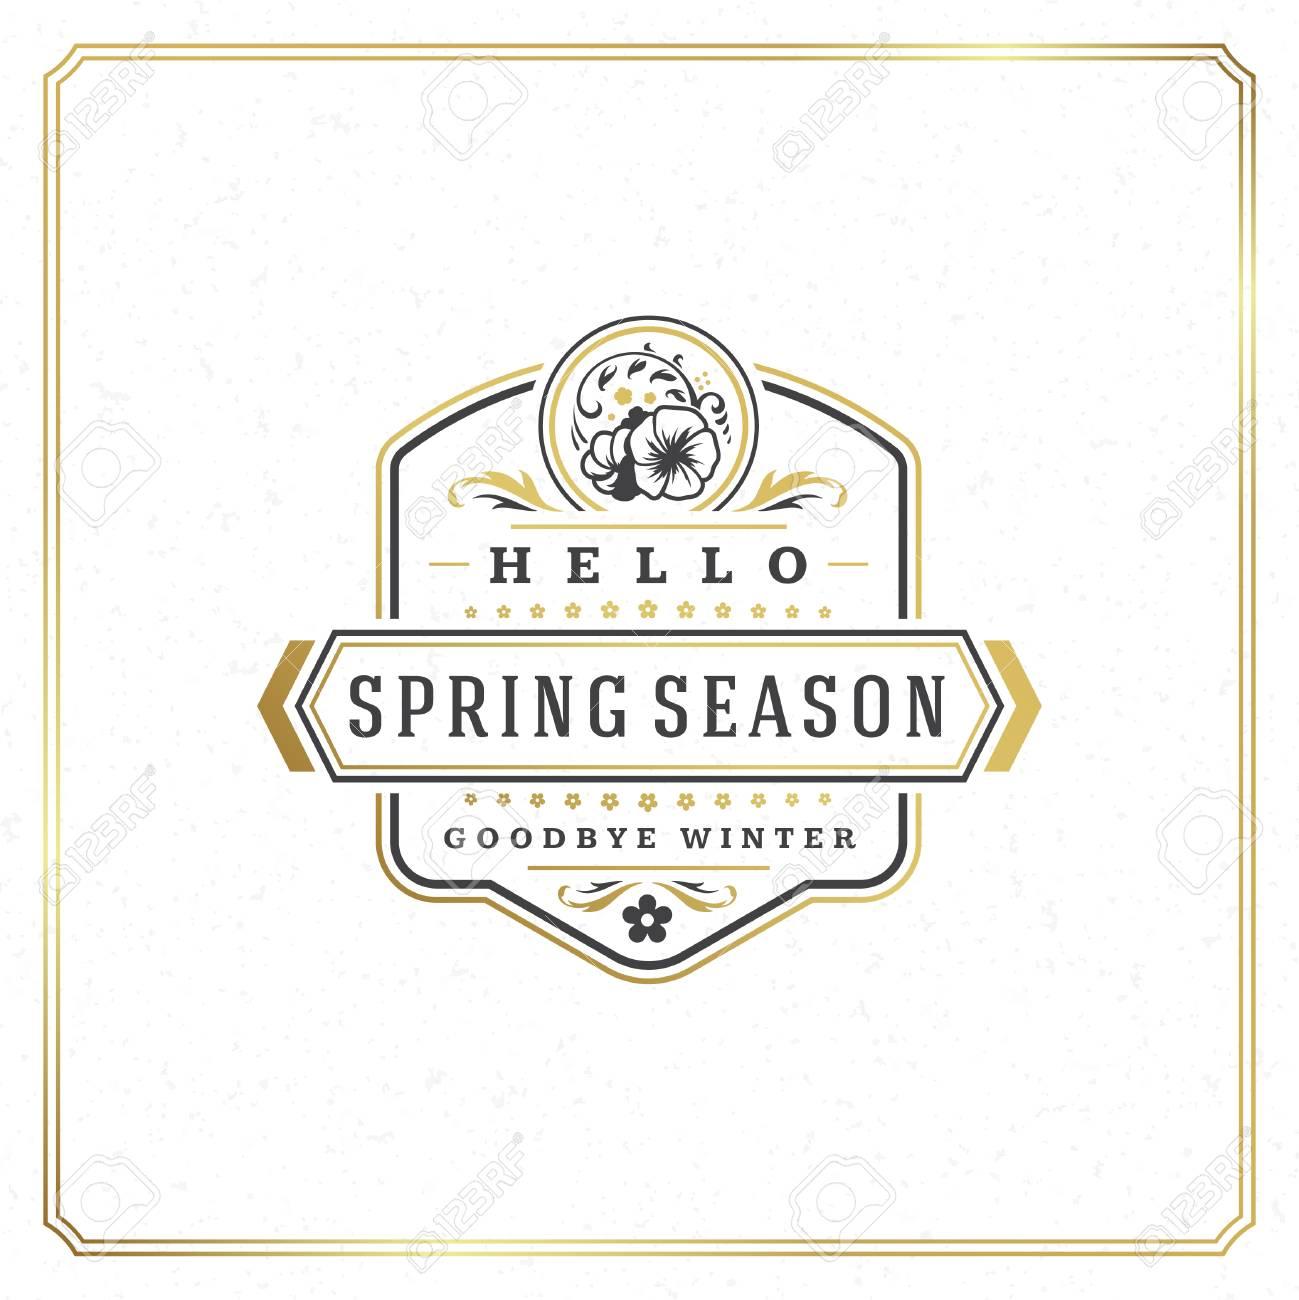 Spring Badge Vector Typographic Design Vintage Greeting Card. Golden  textured. Stock Vector - 73422120